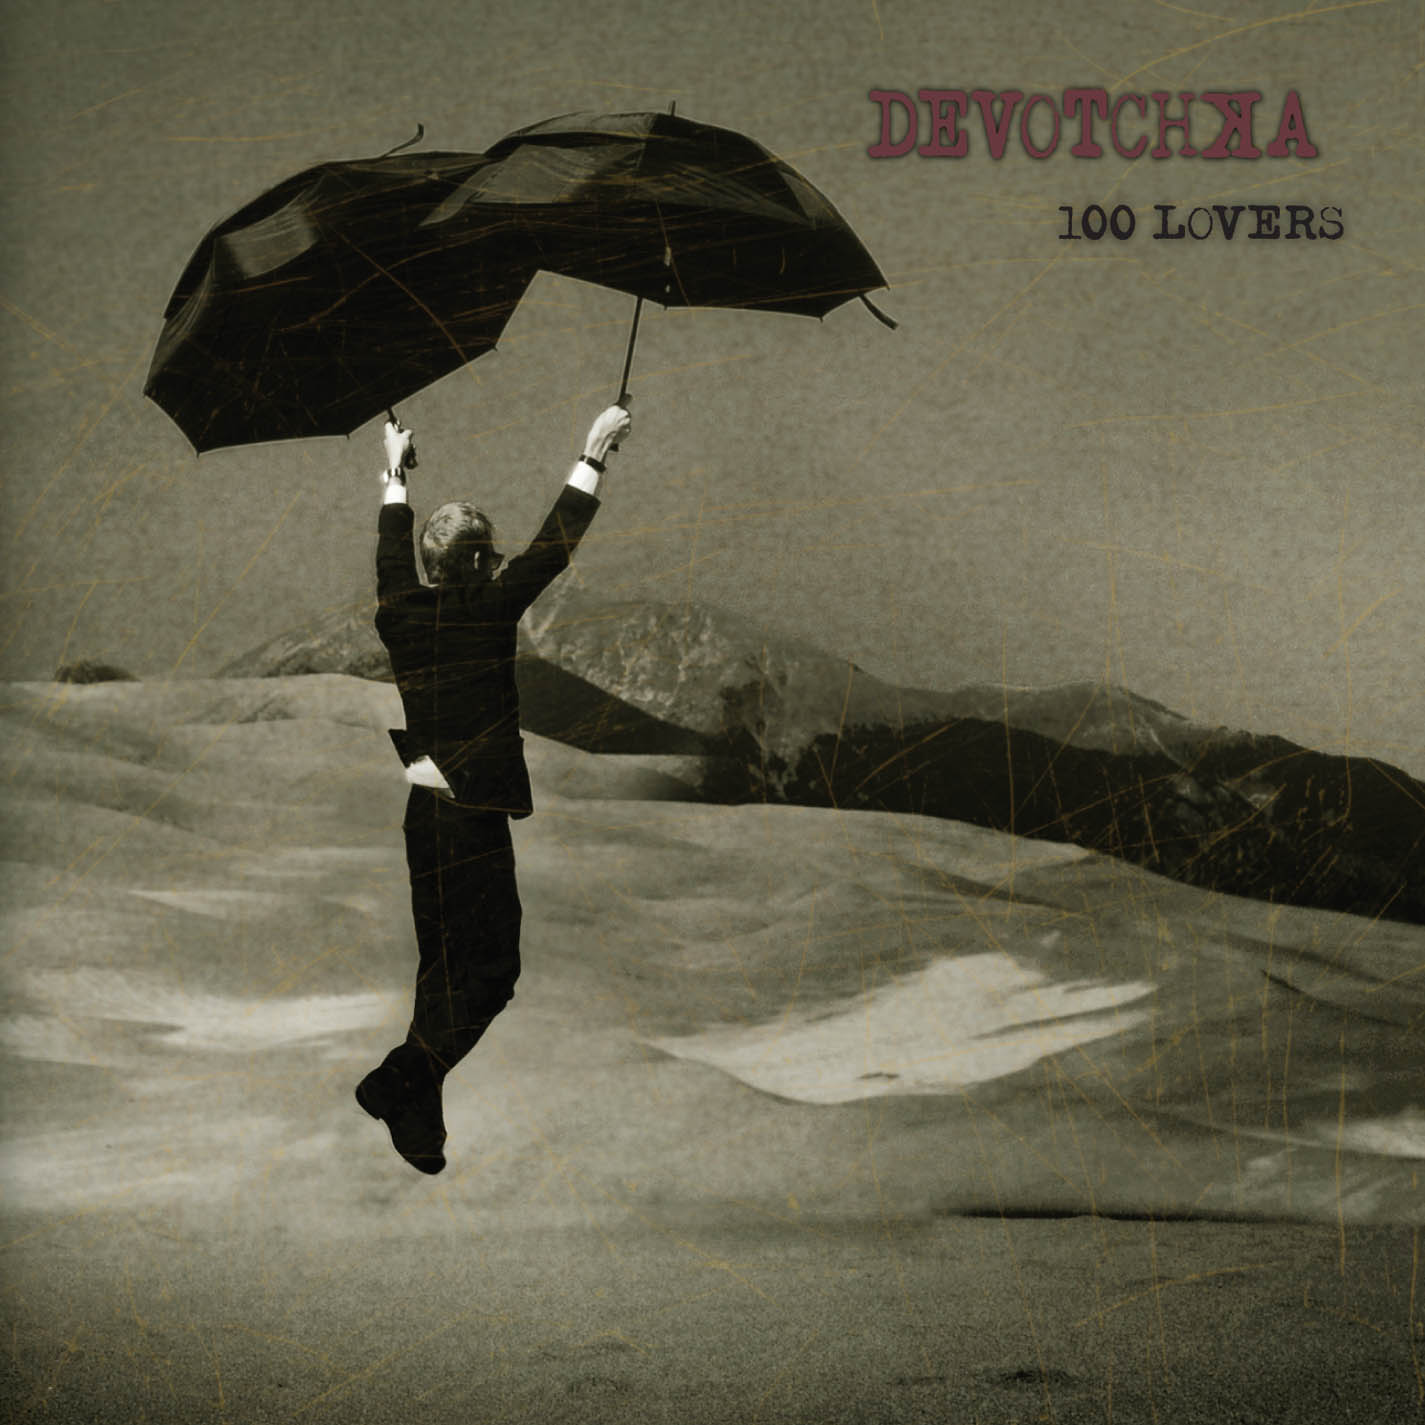 Devotchka, 100 Lovers